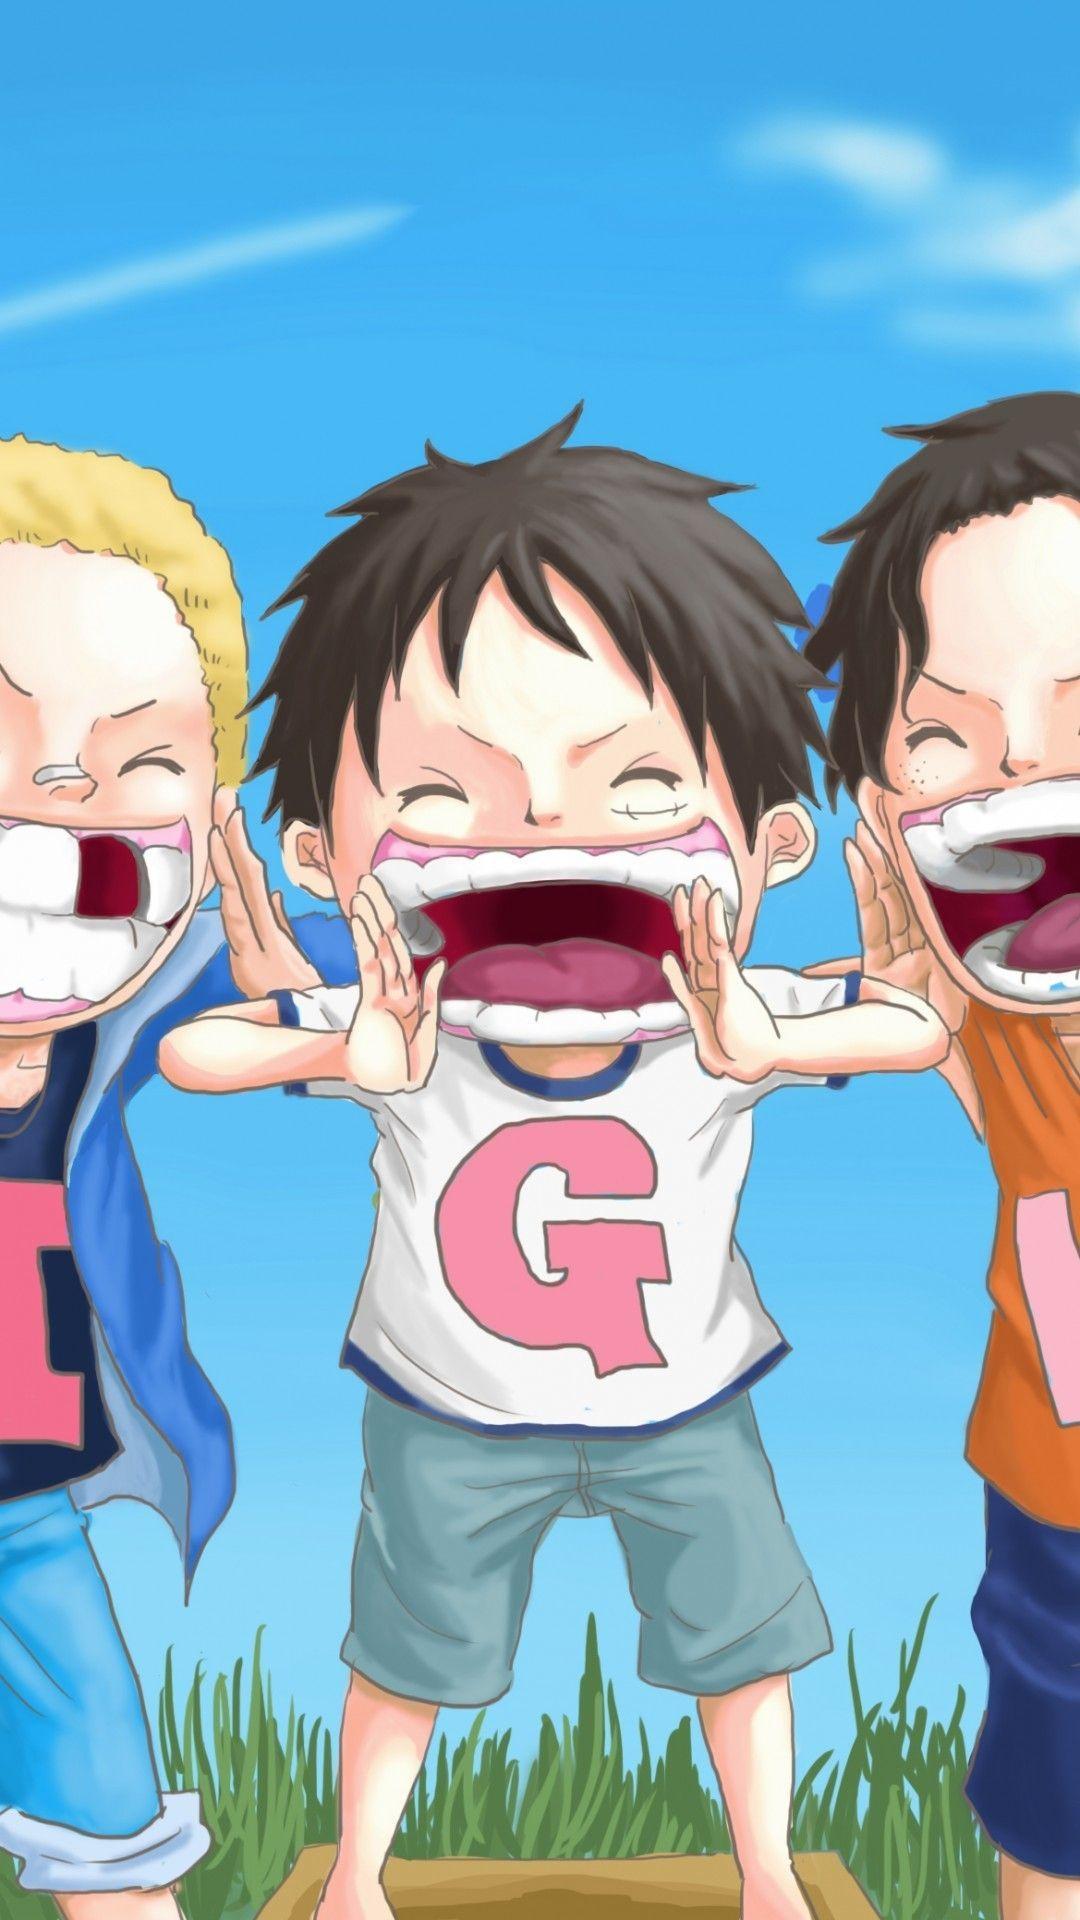 1080x1920 One Piece Ace hình nền